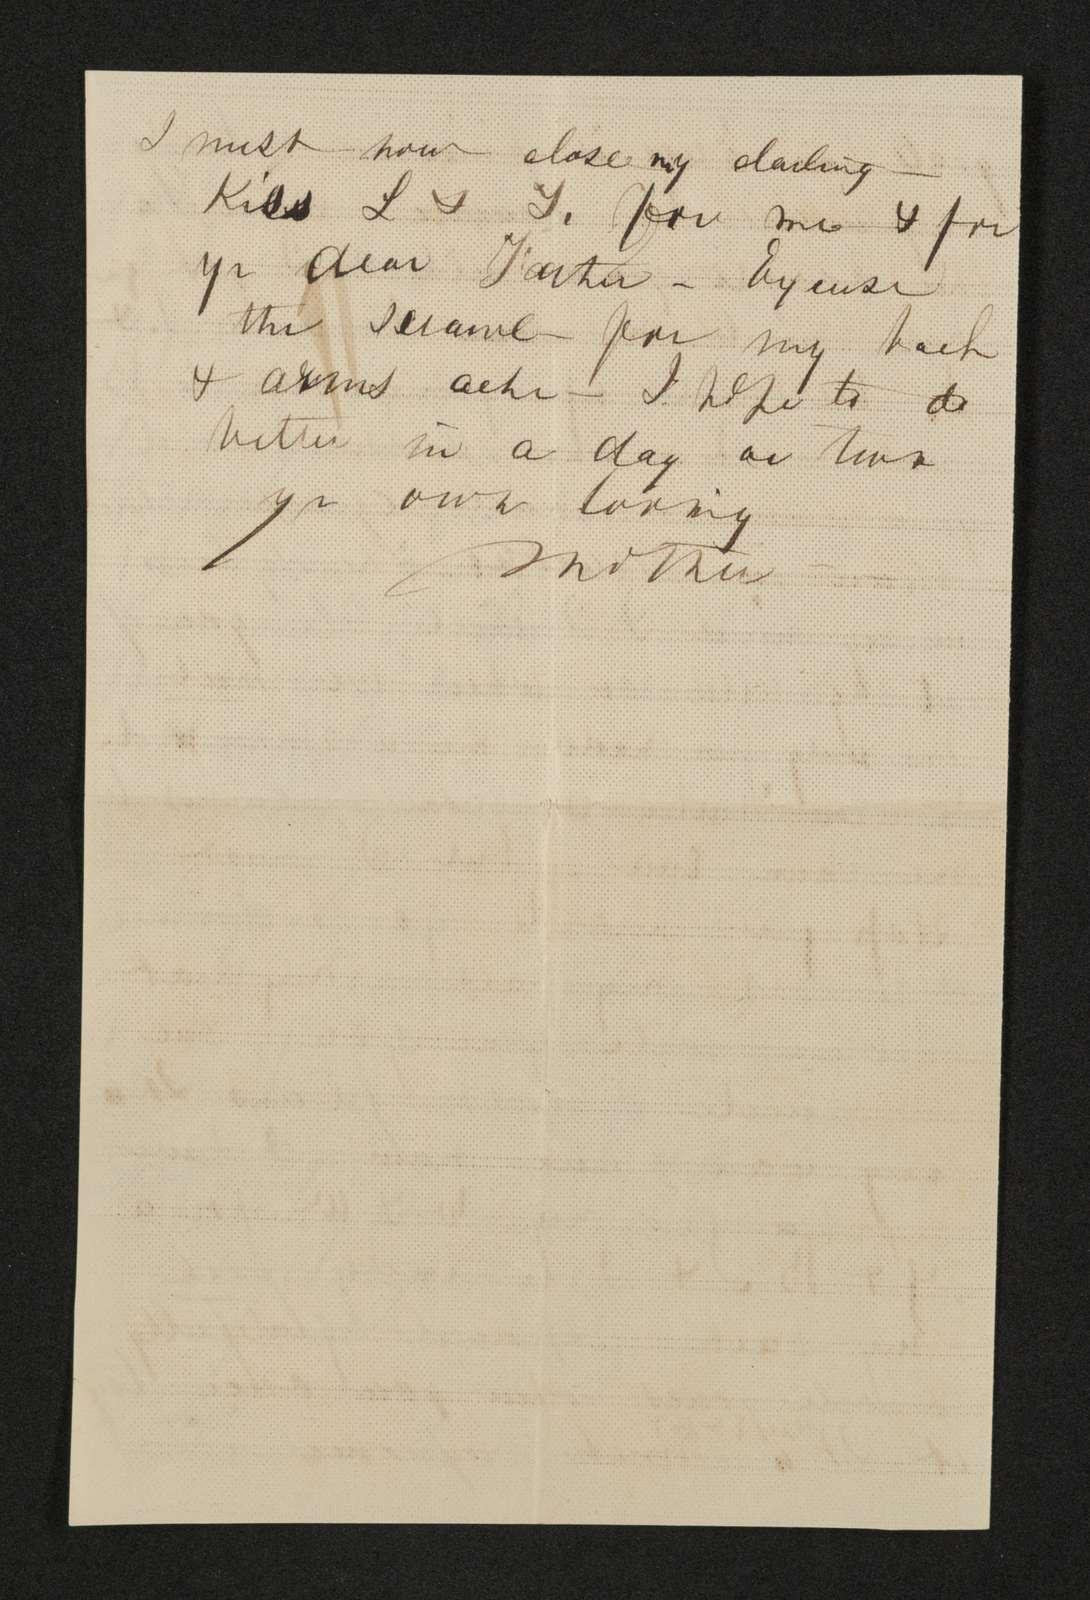 Lewis H. Machen Family Papers: Gresham Family Correspondence, 1834-1925; 1870